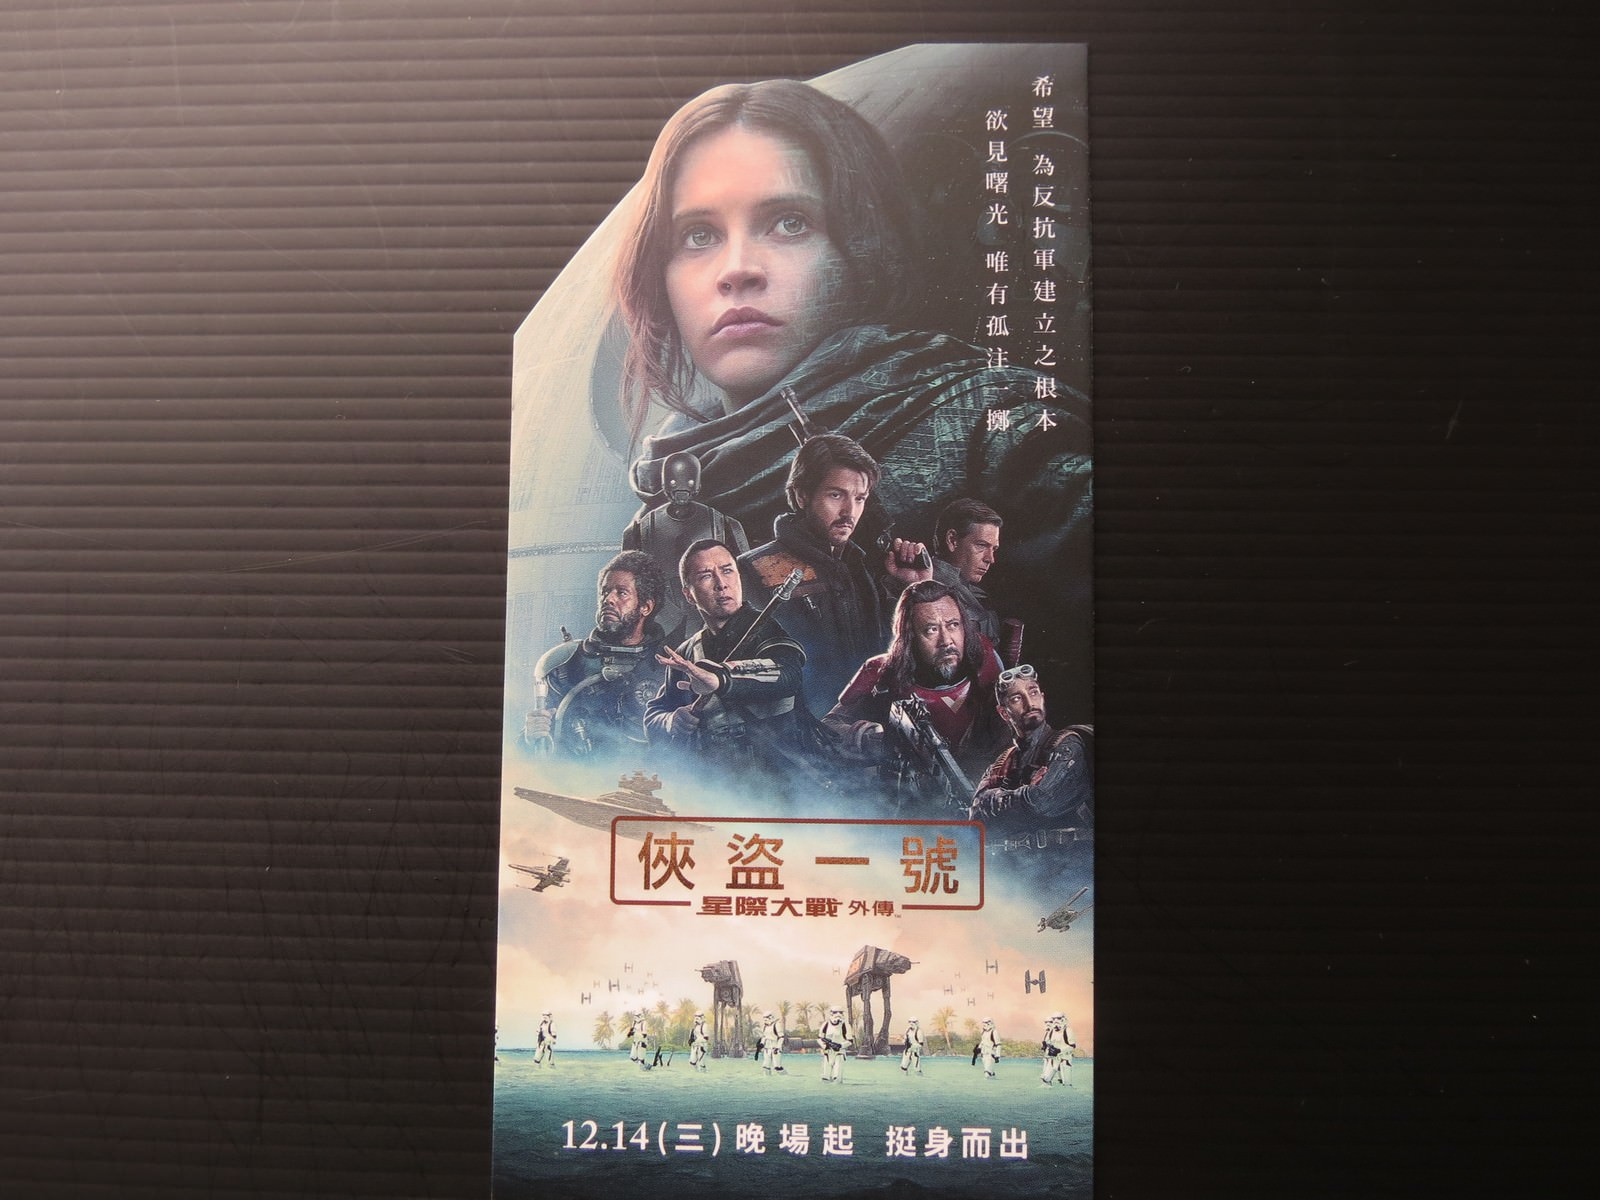 Movie, Rogue One: A Star Wars Story(美國, 2016) / 星際大戰外傳:俠盜一號(台灣.香港) / 星球大战外传:侠盗一号(中國), 特映會邀請卡